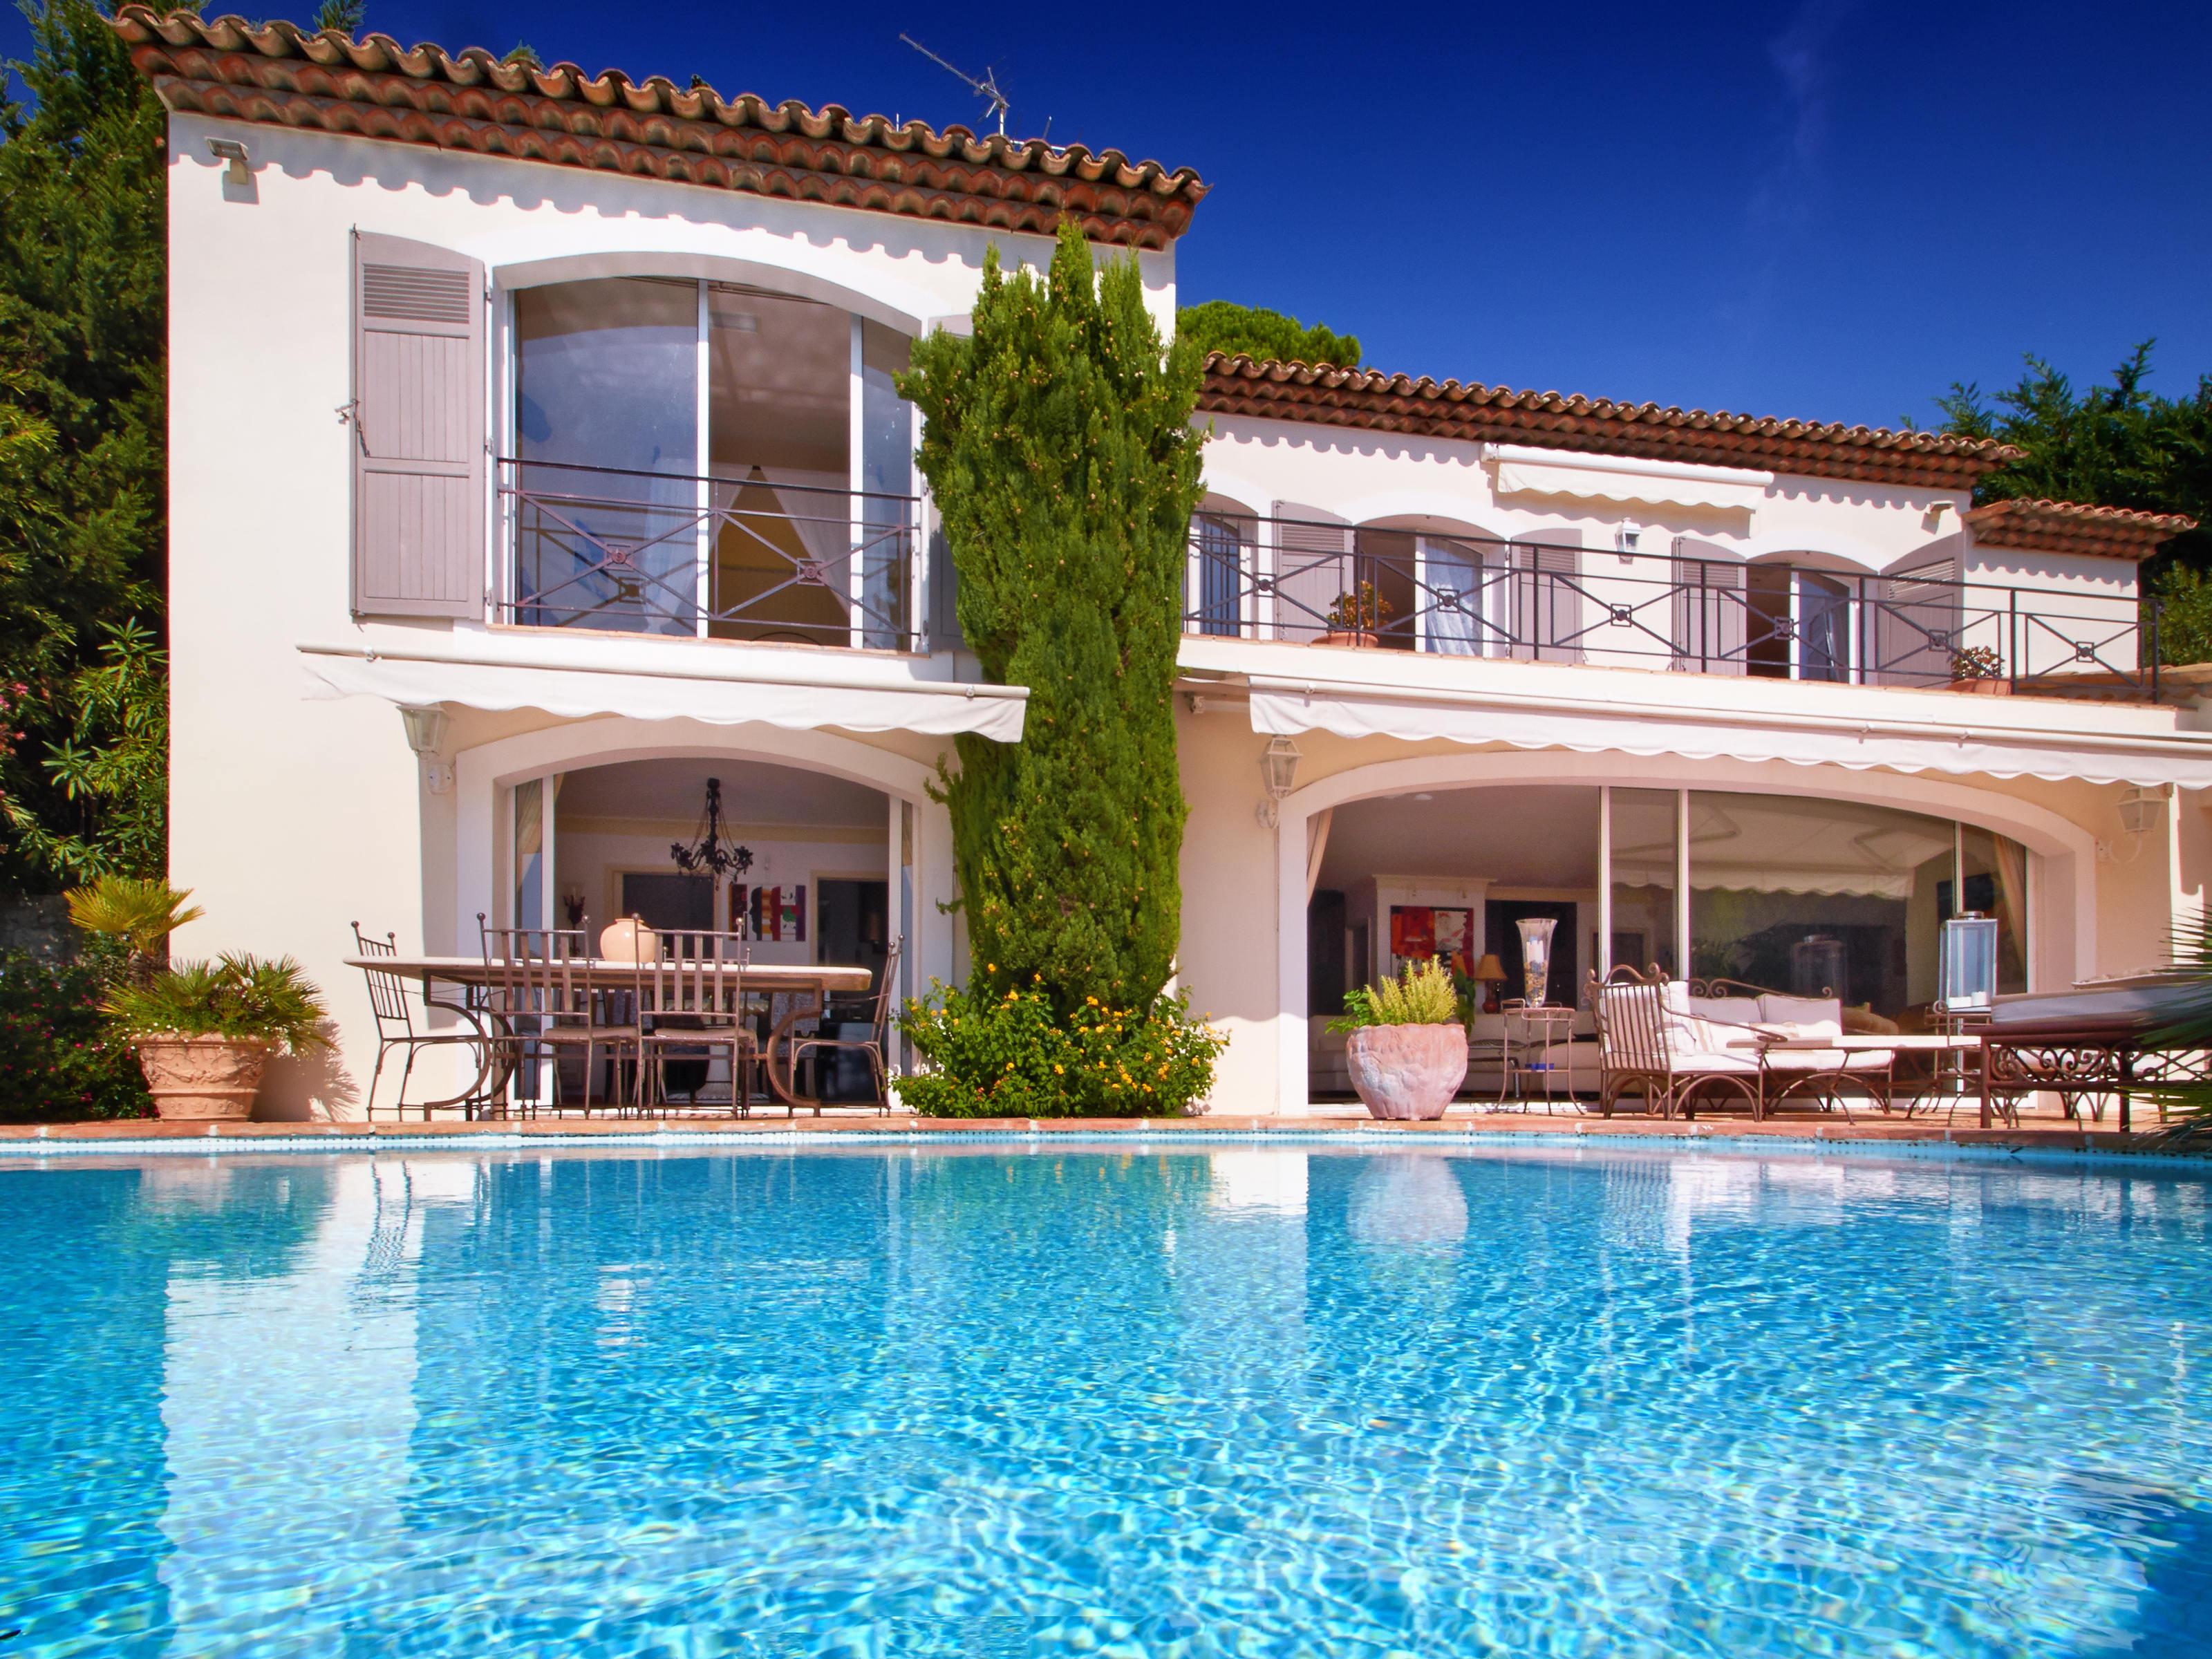 独户住宅 为 销售 在 Villa with panoramic sea view in Mougins village Mougins, 普罗旺斯阿尔卑斯蓝色海岸 06250 法国